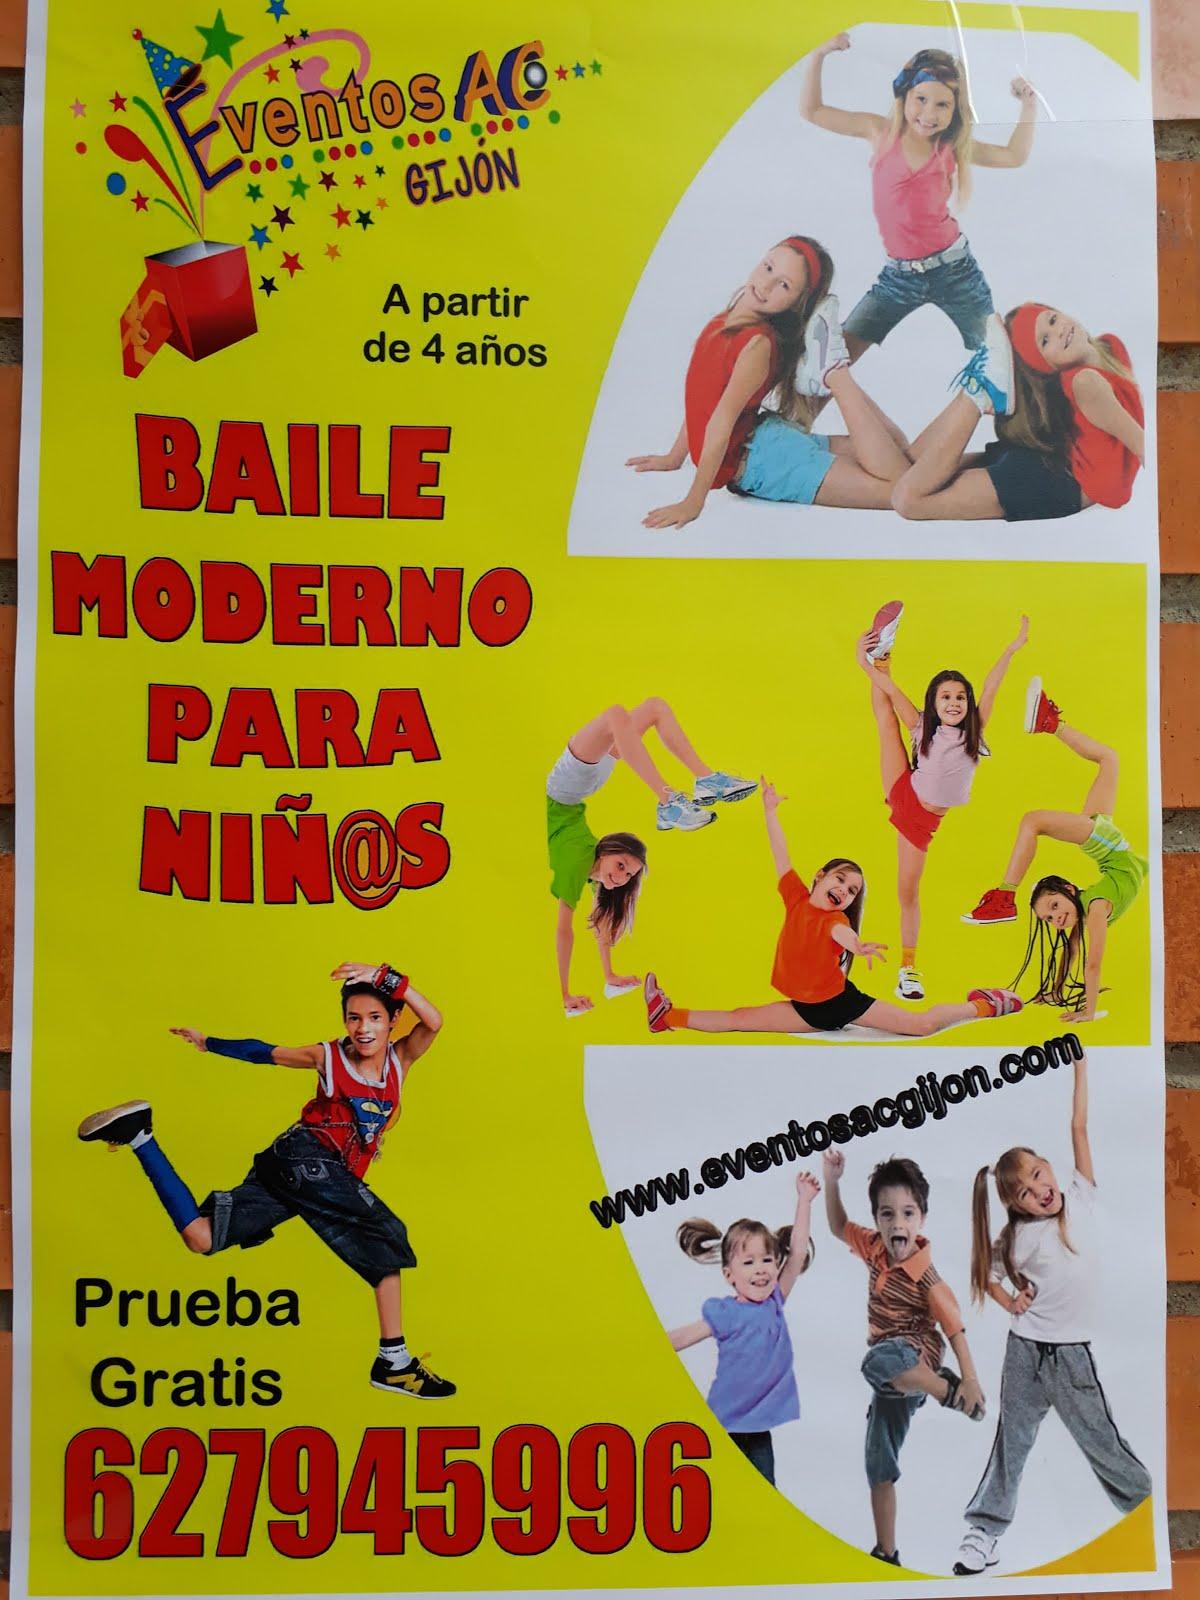 BAILE MODERNO PARA NIÑOS